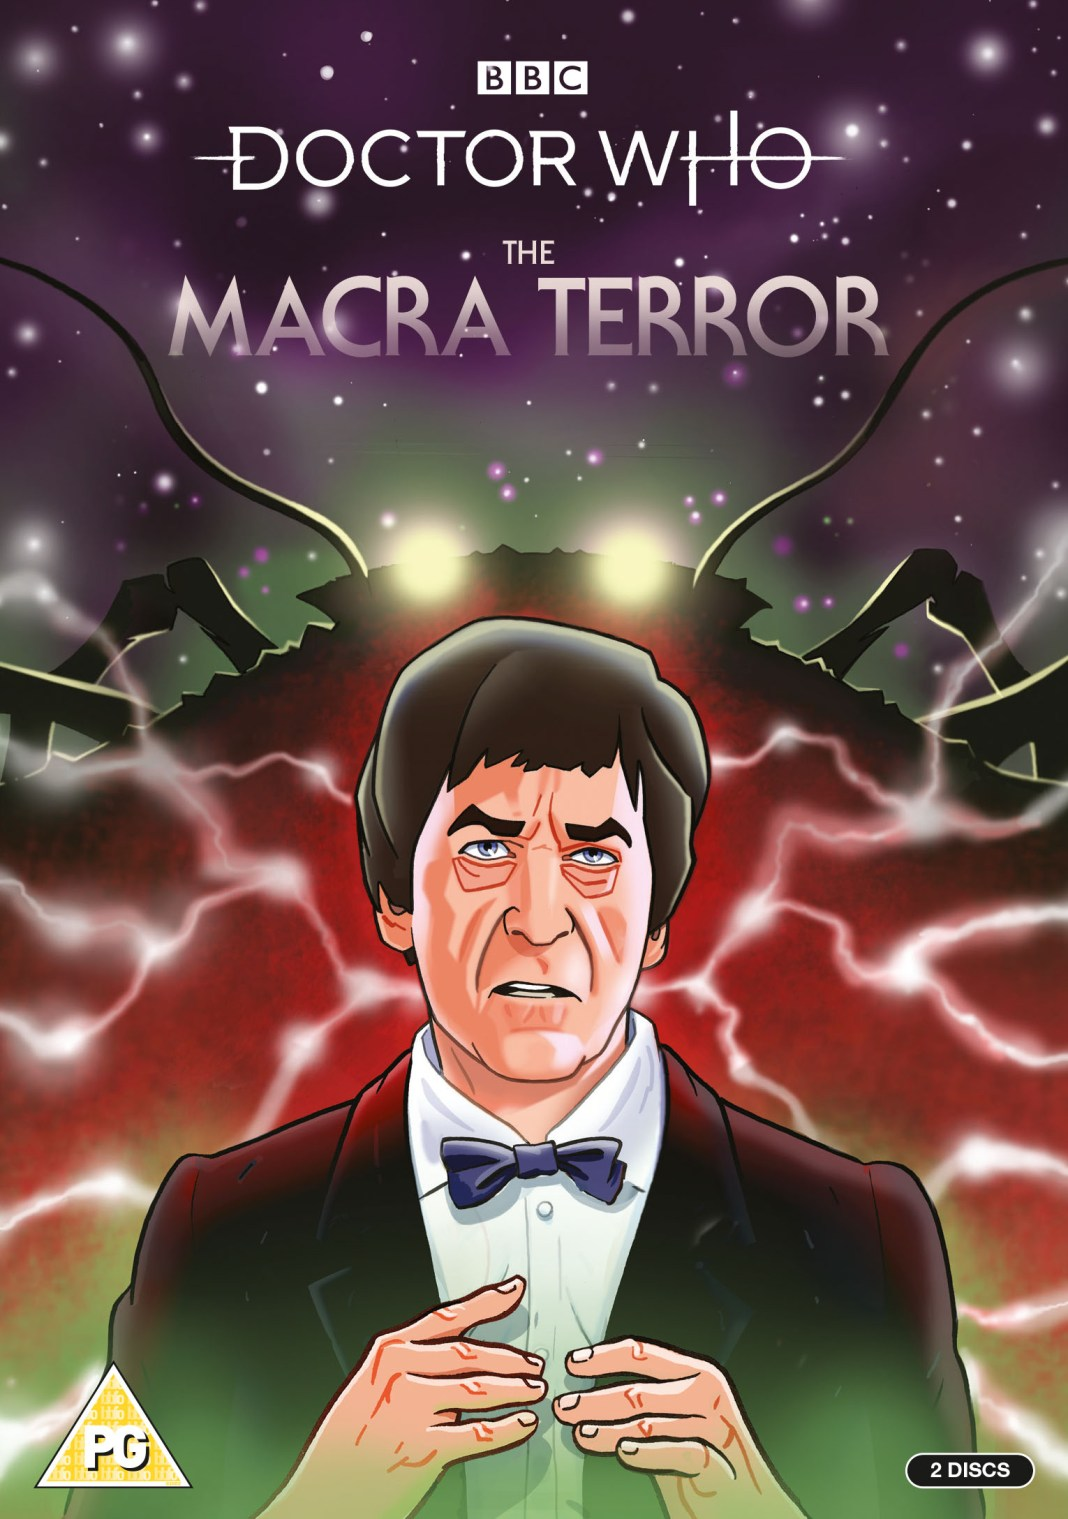 Doctor Who: The Macra Terror DVD cover (c) BBC Studios